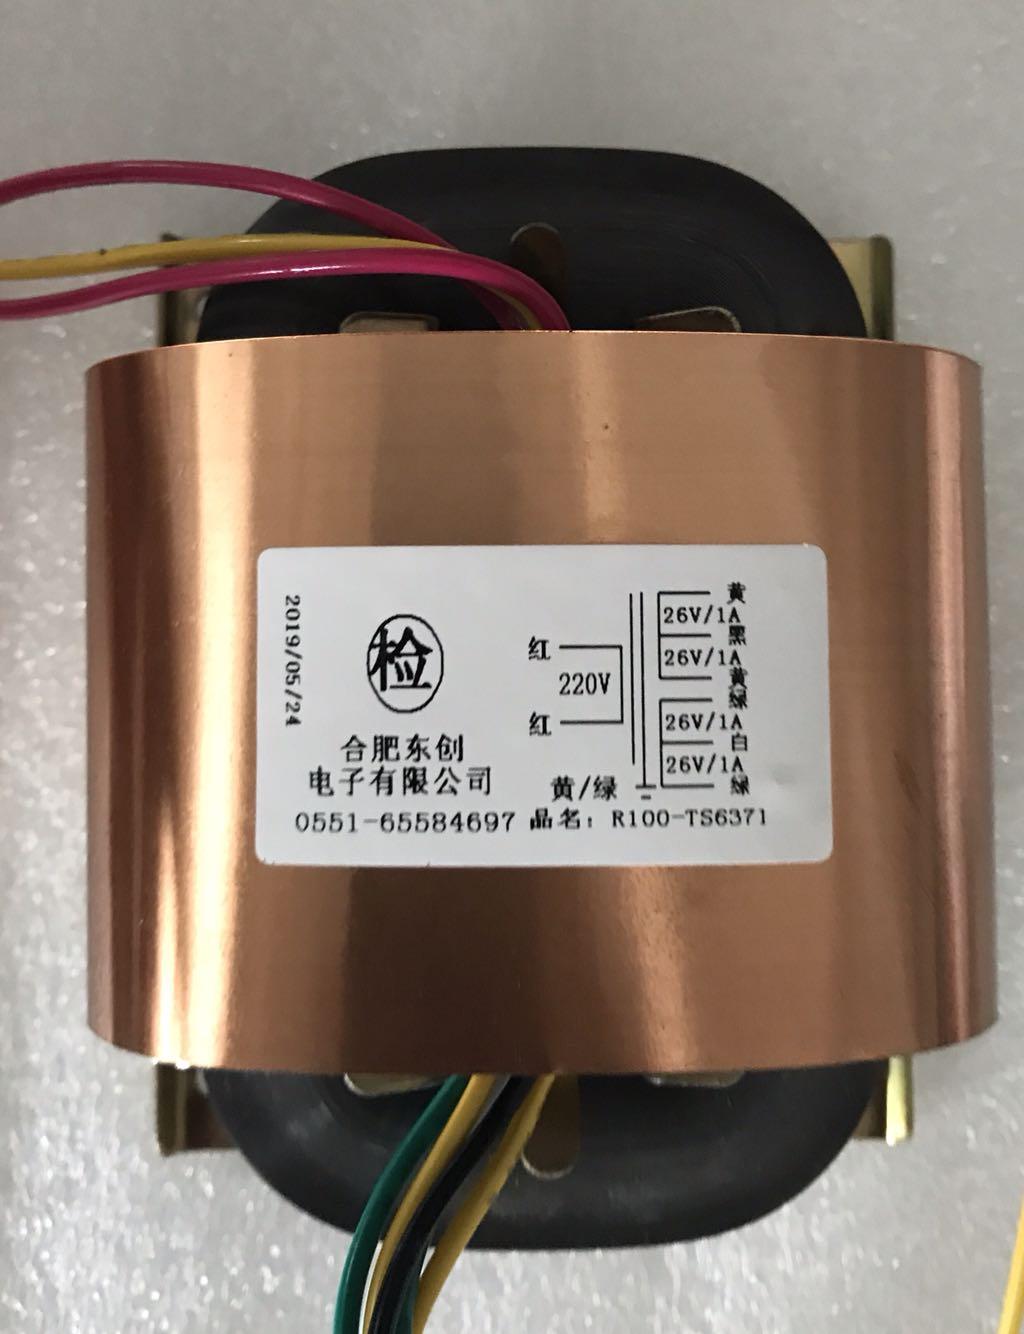 2*26V-0-26V 1A R Core Transformer 100VA R100 custom transformer 220V input copper shield Power amplifier